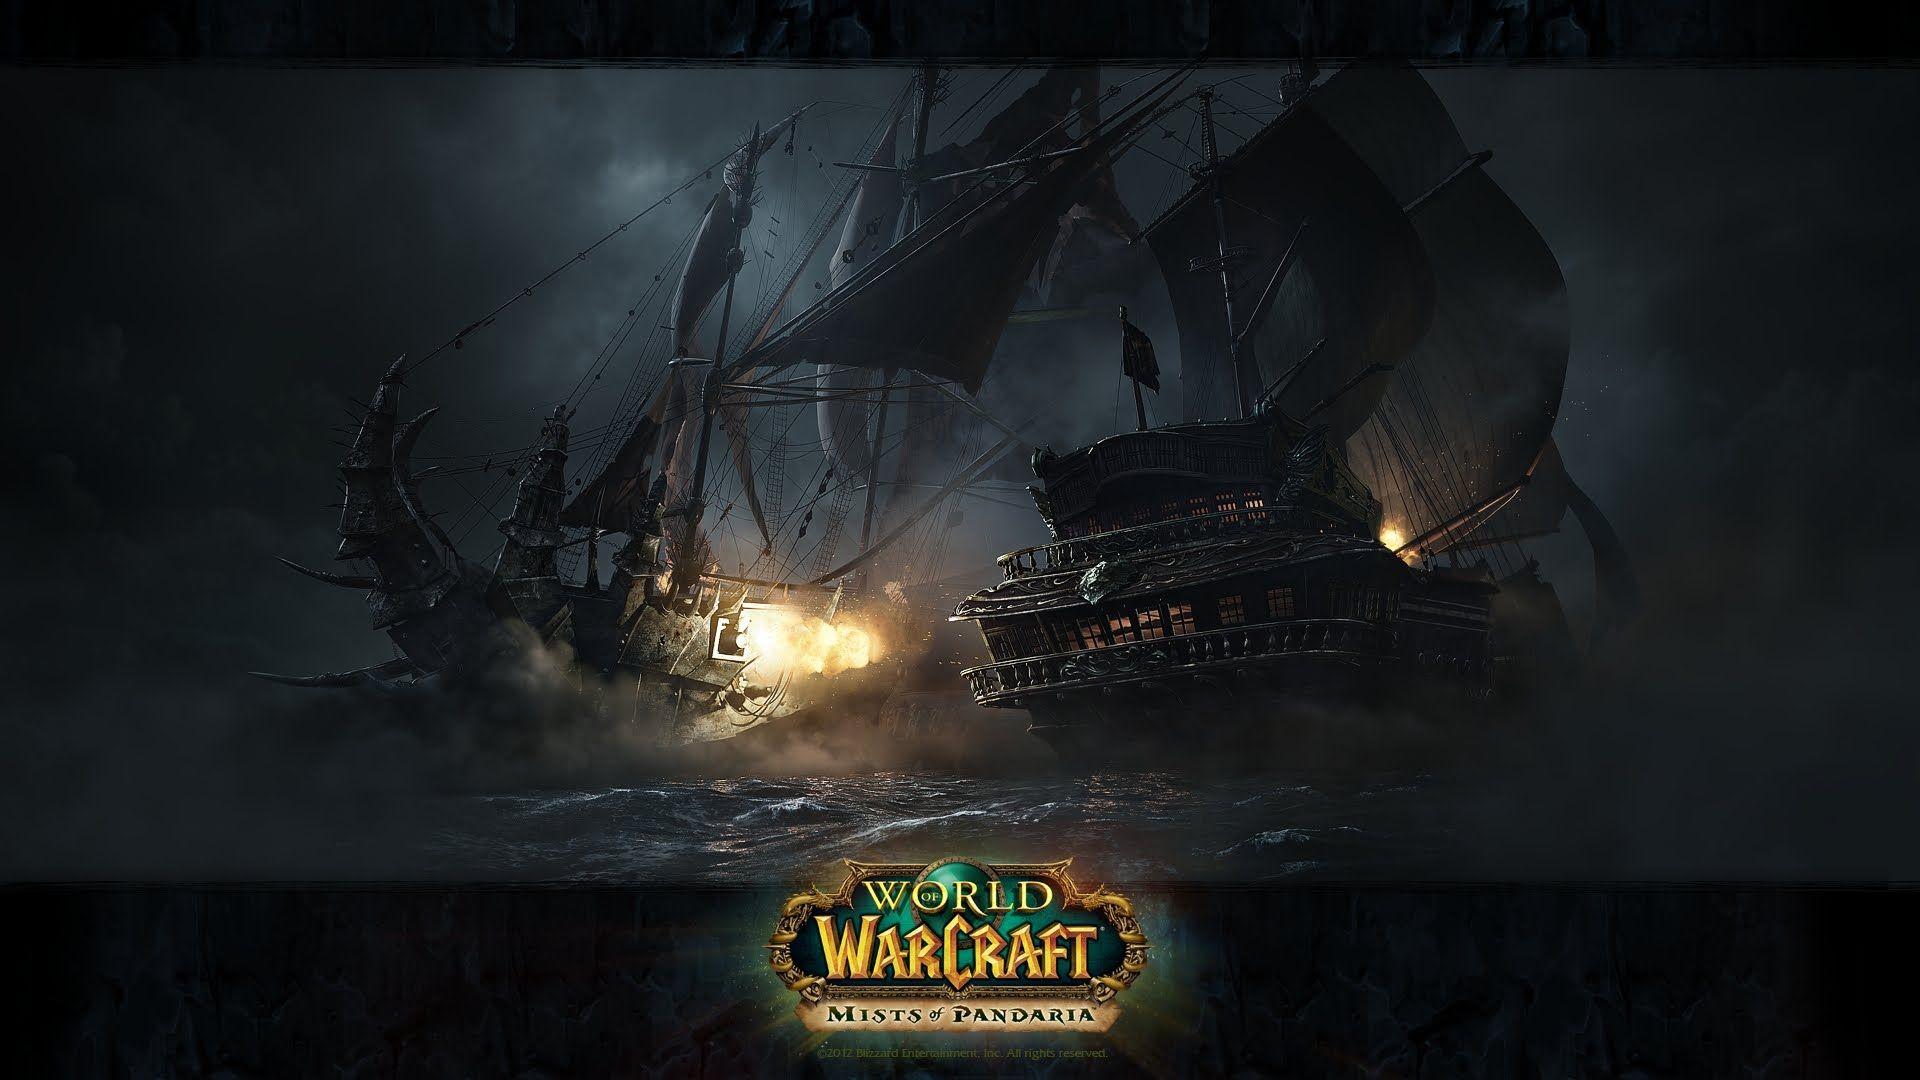 ship battle world of warcraft pirate ships 4 0 pinterest